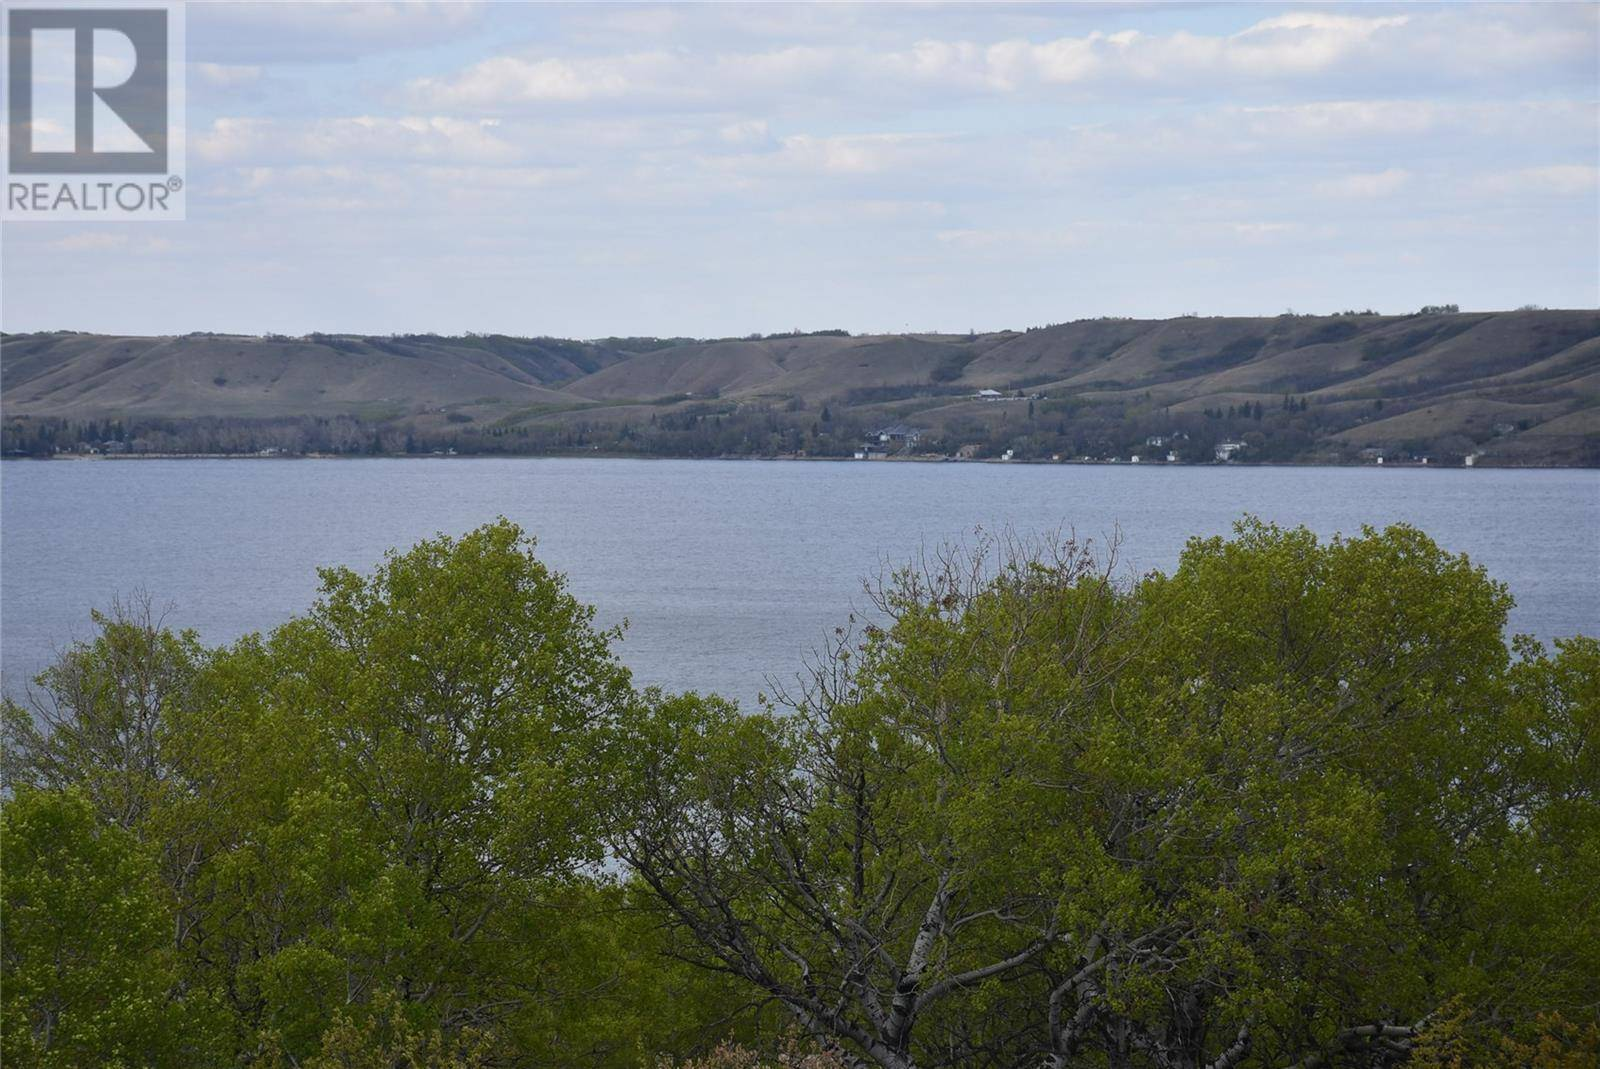 Residential property for sale at 609 Berry Hills Rd Katepwa Beach Saskatchewan - MLS: SK772614